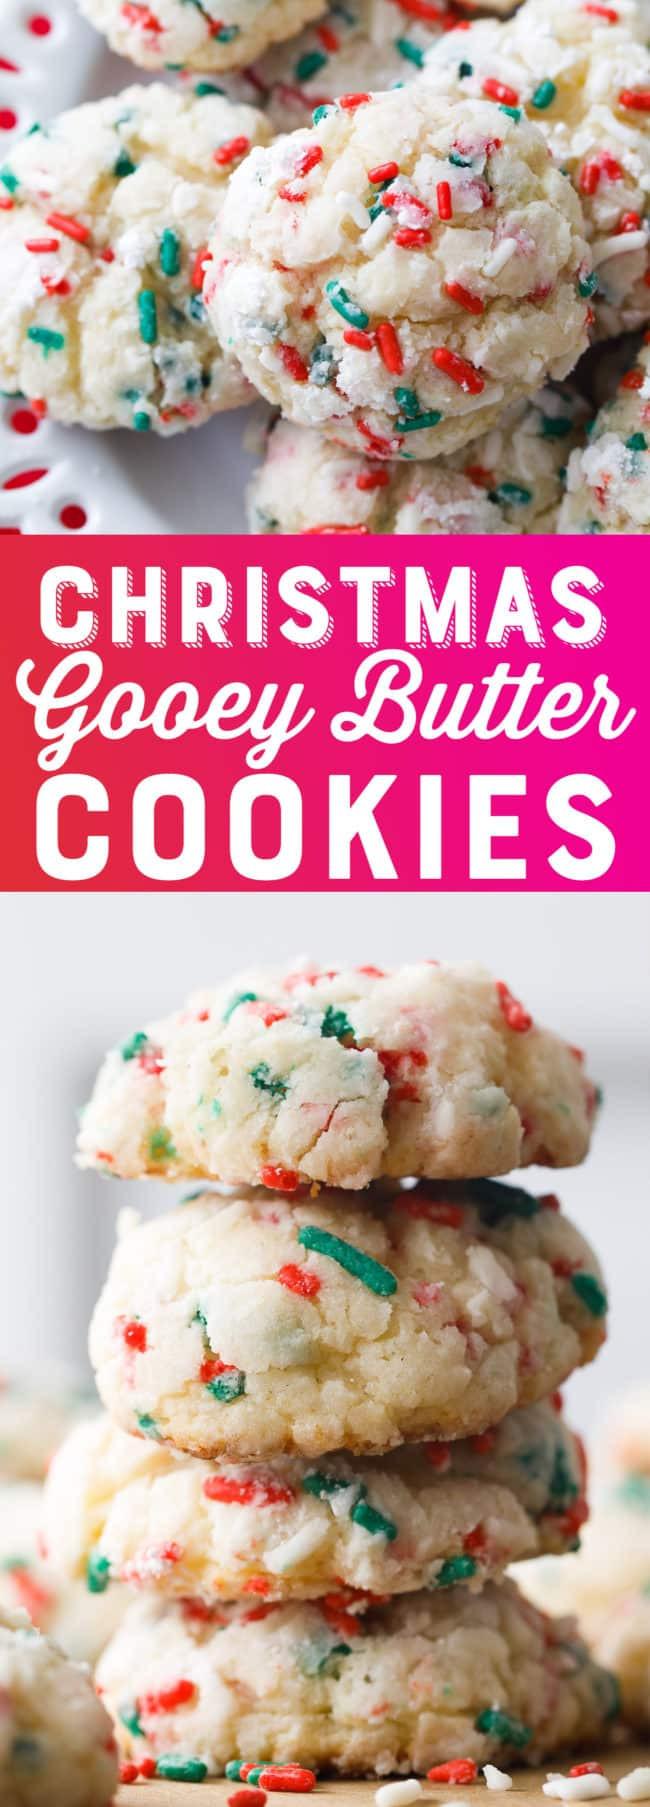 Gooey Butter Christmas Cookies  Christmas Gooey Butter Cookies Recipe Gooey Butter